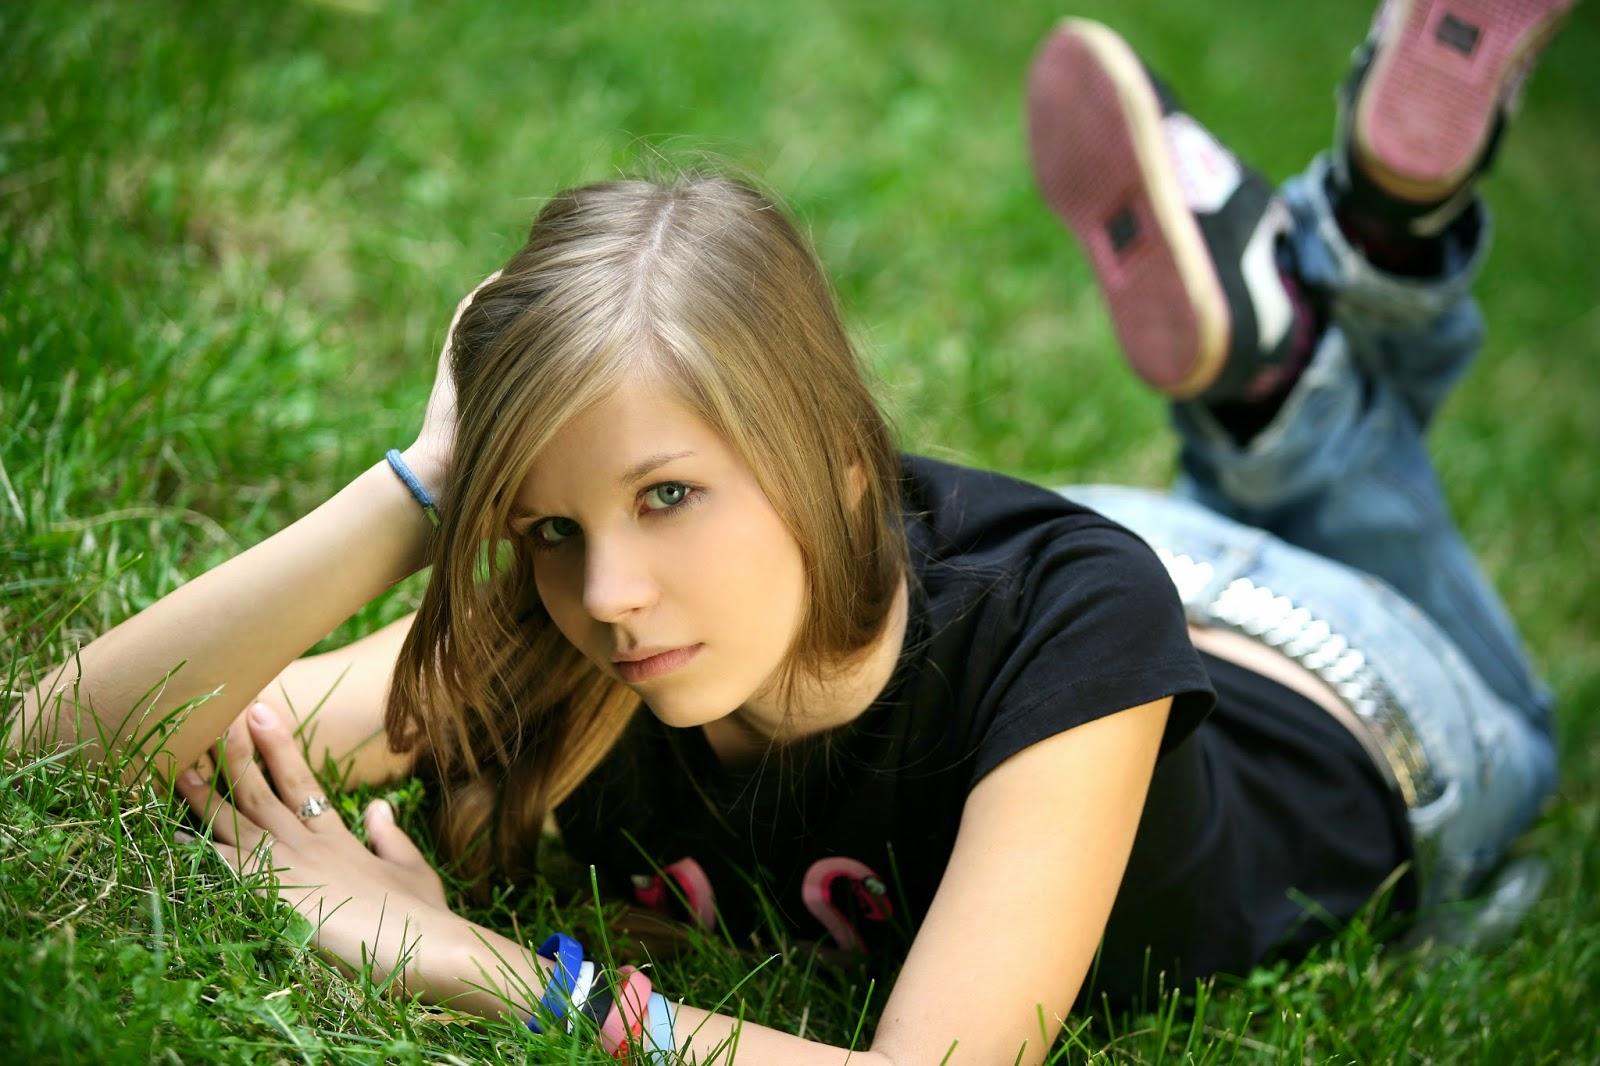 Фото секс девочки подростки 24 фотография